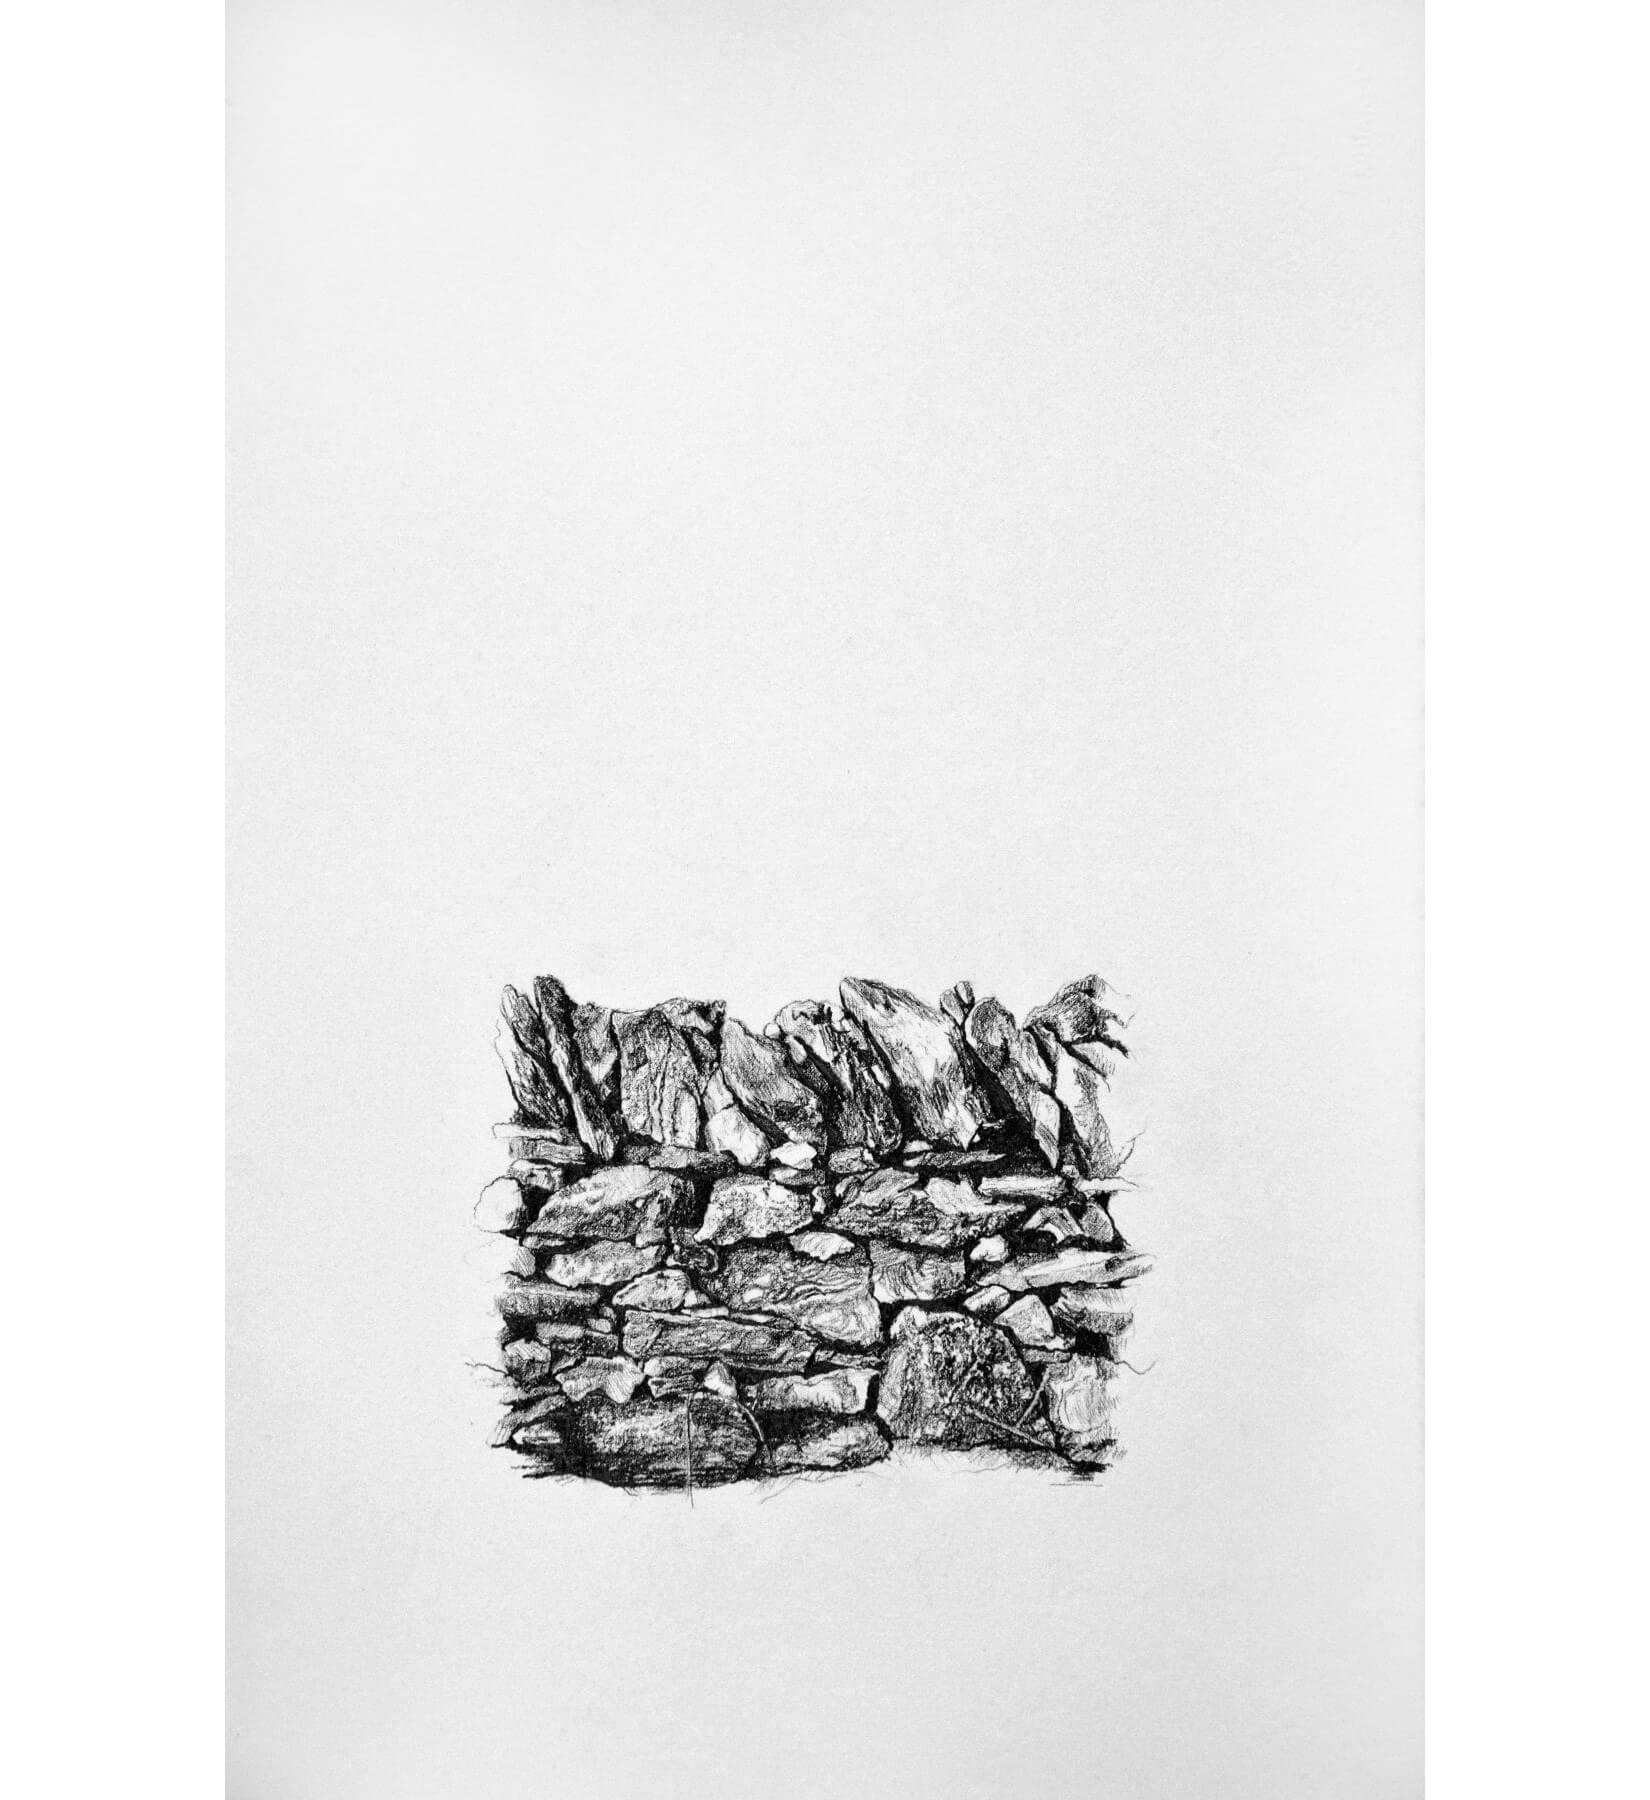 Xerolithia 2, drawing. Graphite on Arches Paper, by artist Neva Bergemann